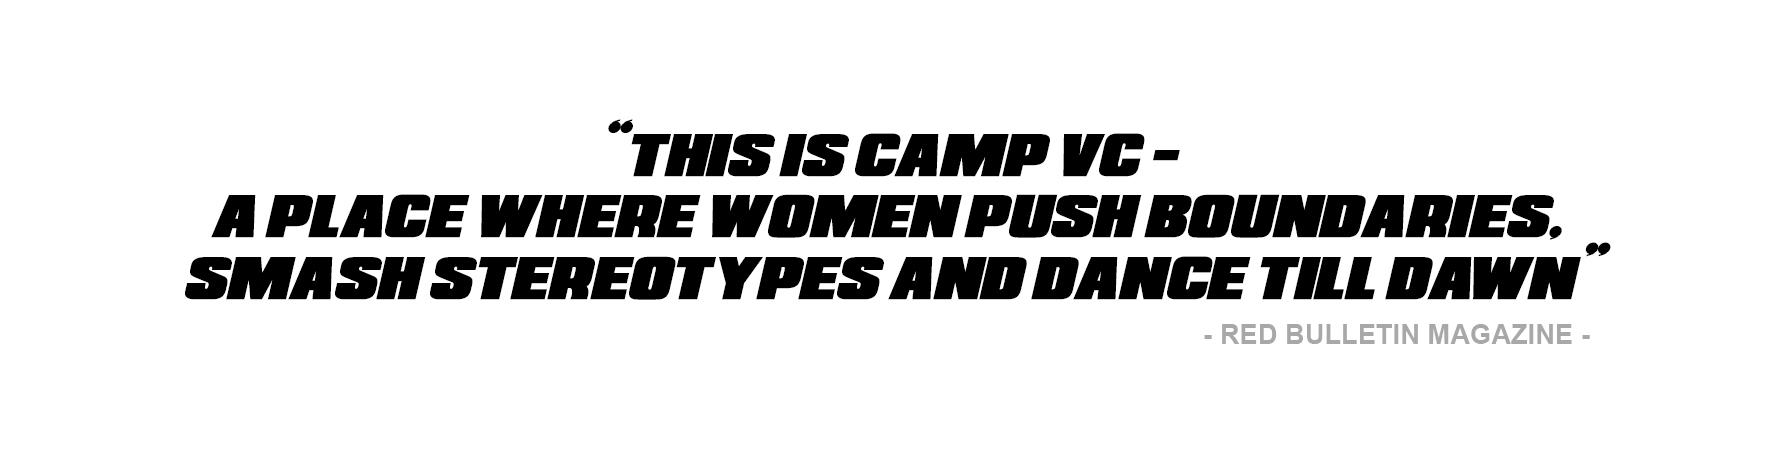 CAMP VC RED BULLETIN .jpg